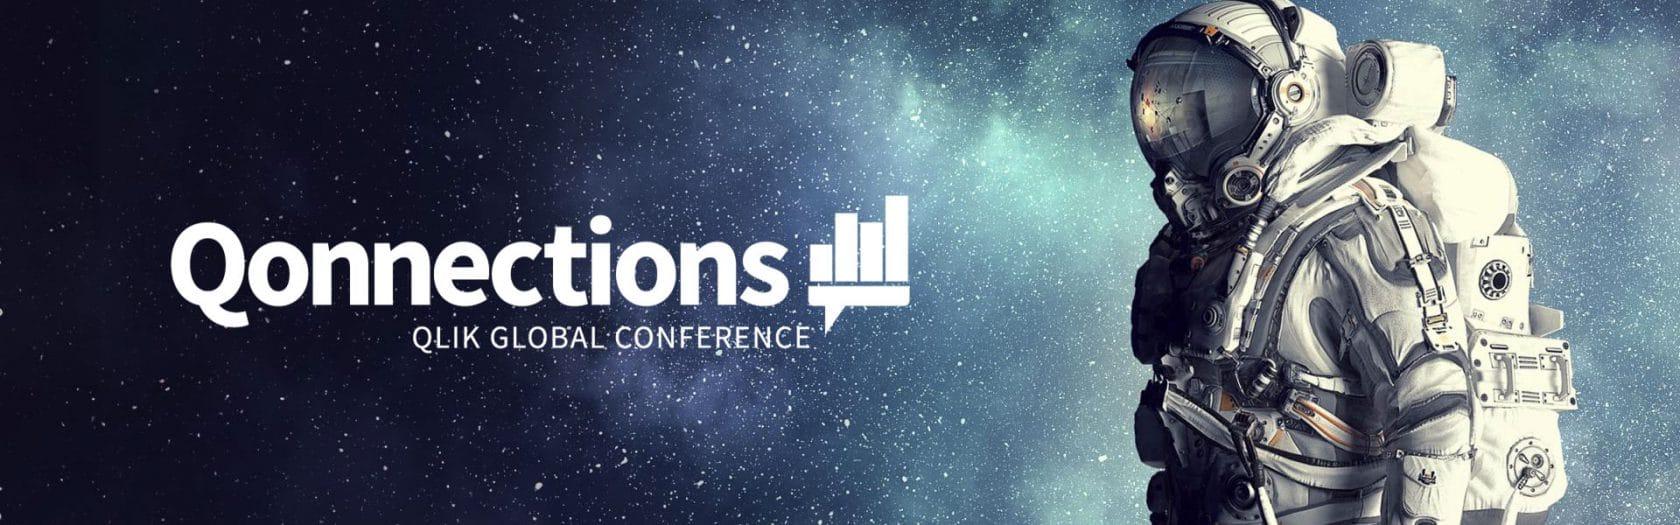 Qonnections 2019 Blogheader